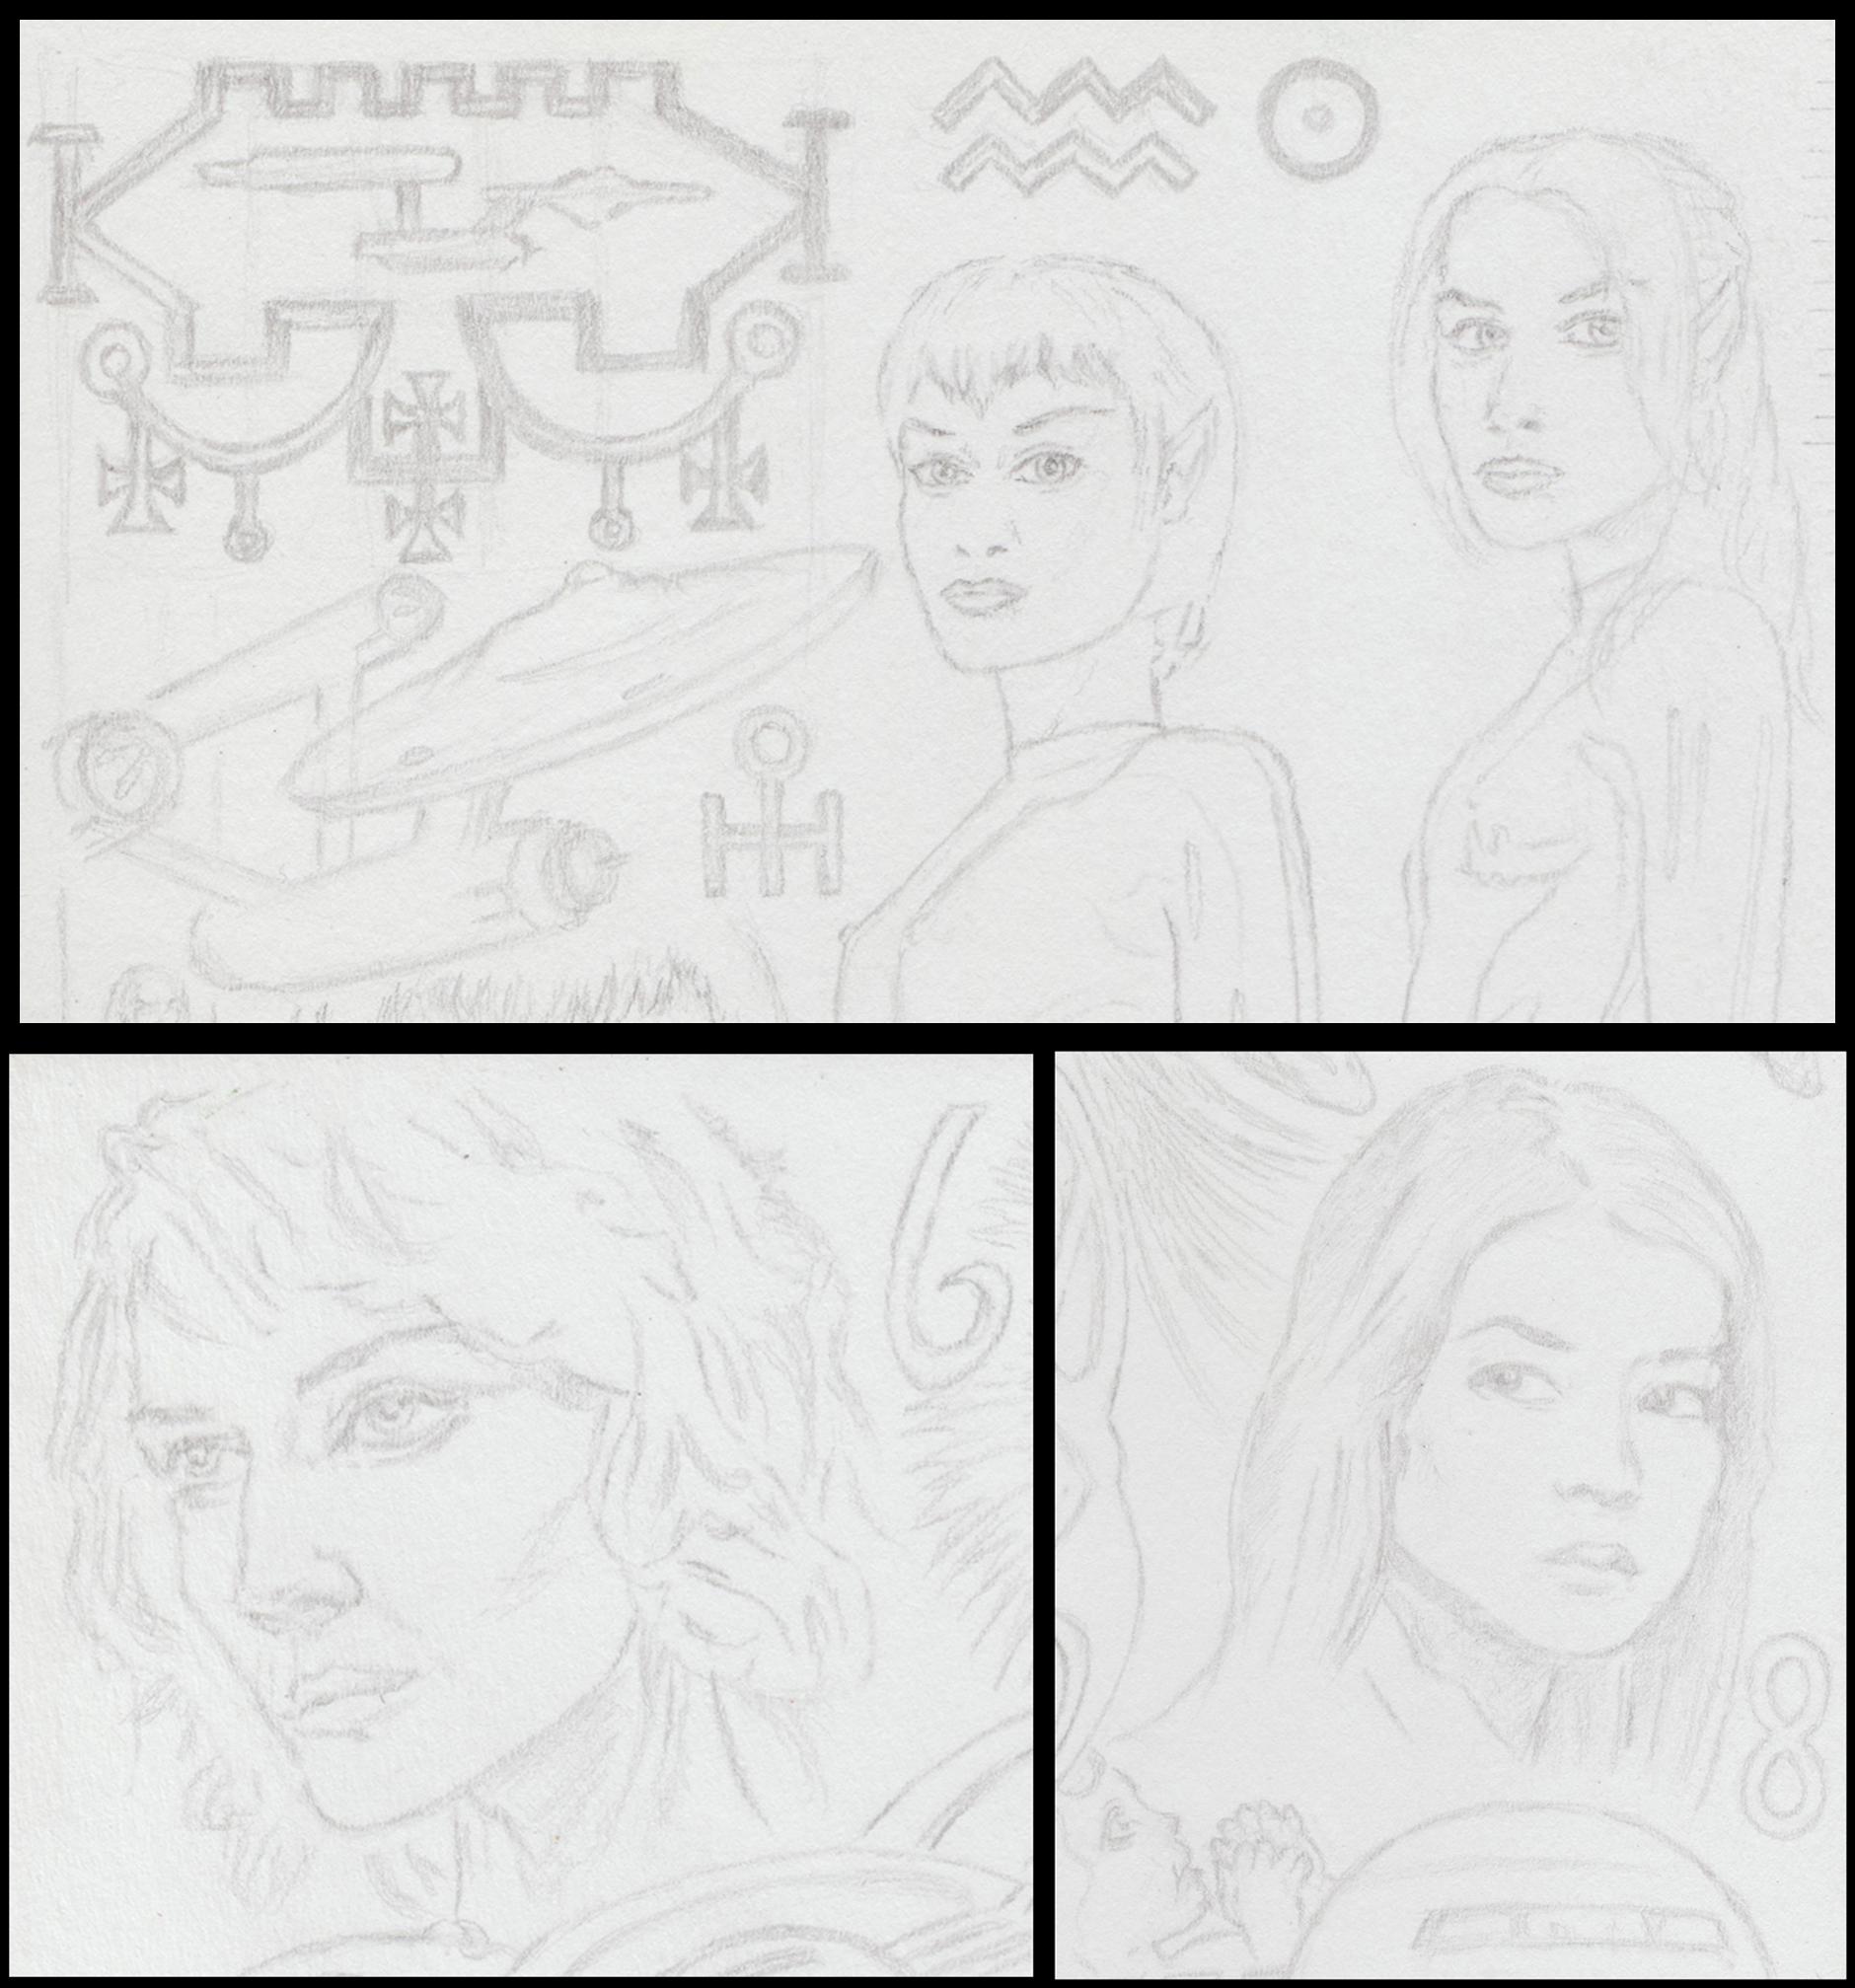 goetia_girls_lilith's_harem_original_artwork_comic_pencils_succubus_art_faustus_crow_mardun (1)